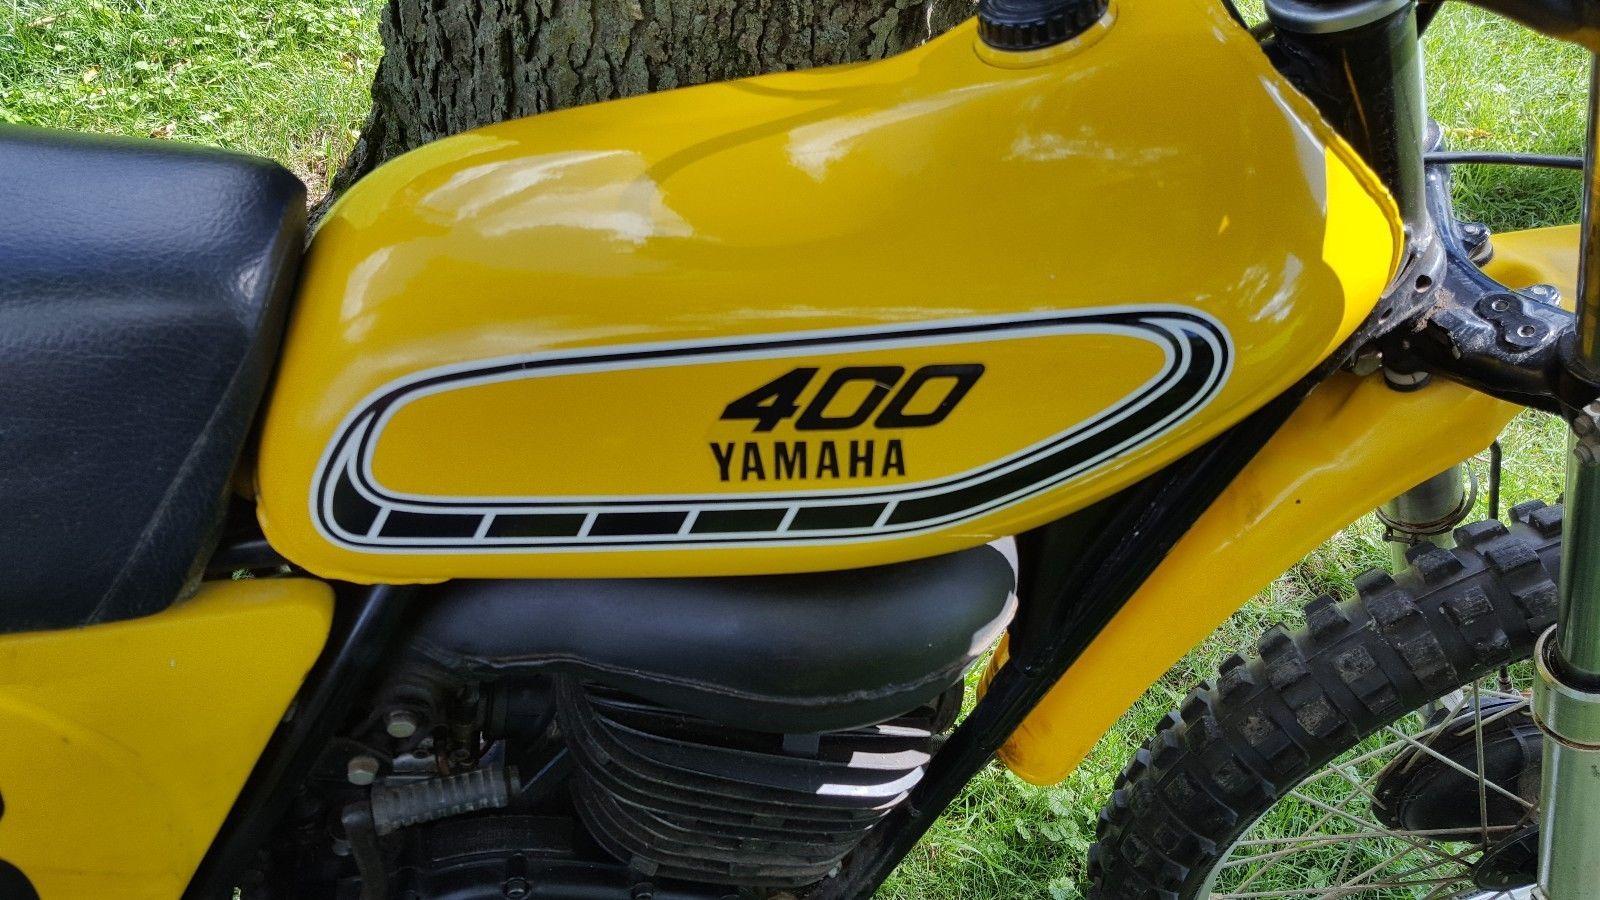 eBay: 1976 Yamaha YZ VINTAGE 1976 YAMAHA YZ 400 MOTORCYCLE MOTOCROSS